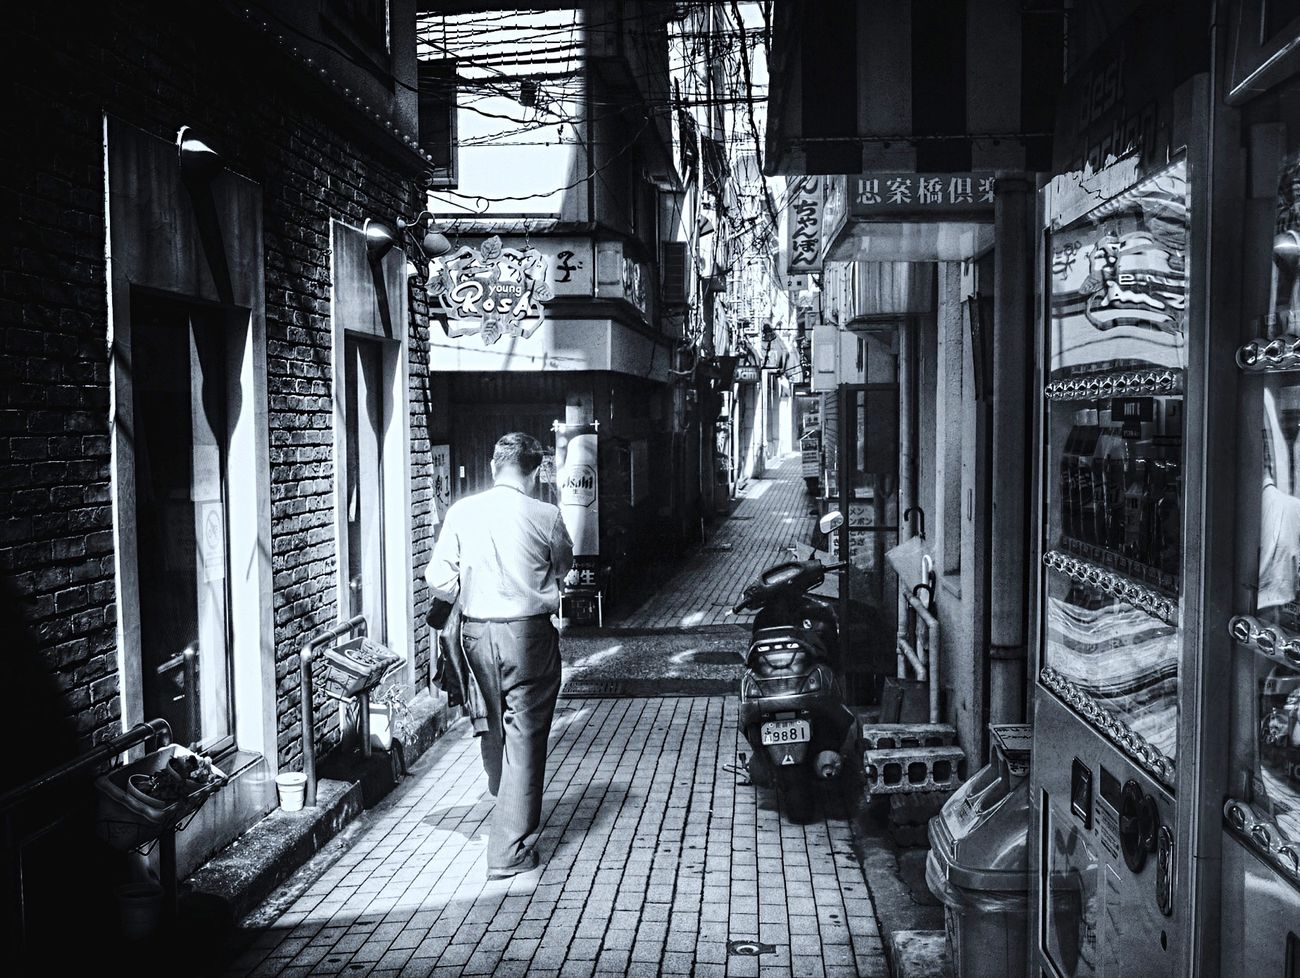 Walking around Nagasaki Reedited Noir Et Blanc Light And Shadow Vending Machine Reflection Narrow Street On The Street Corner B&w Street Photography de Good morning Nagasaki City